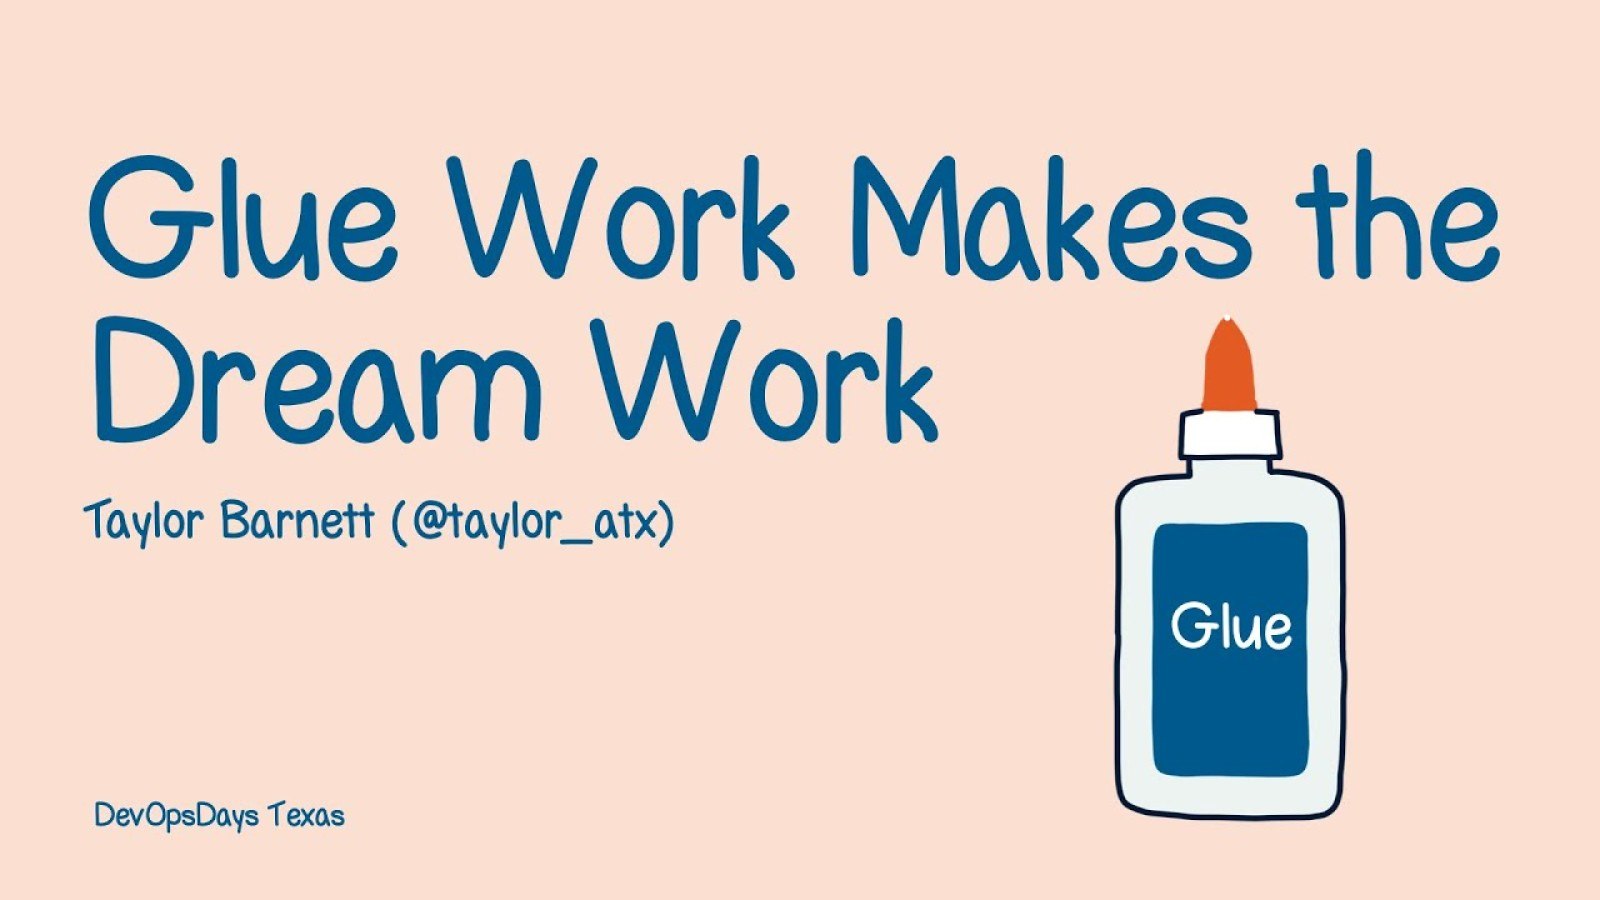 Glue Work Makes the Dream Work